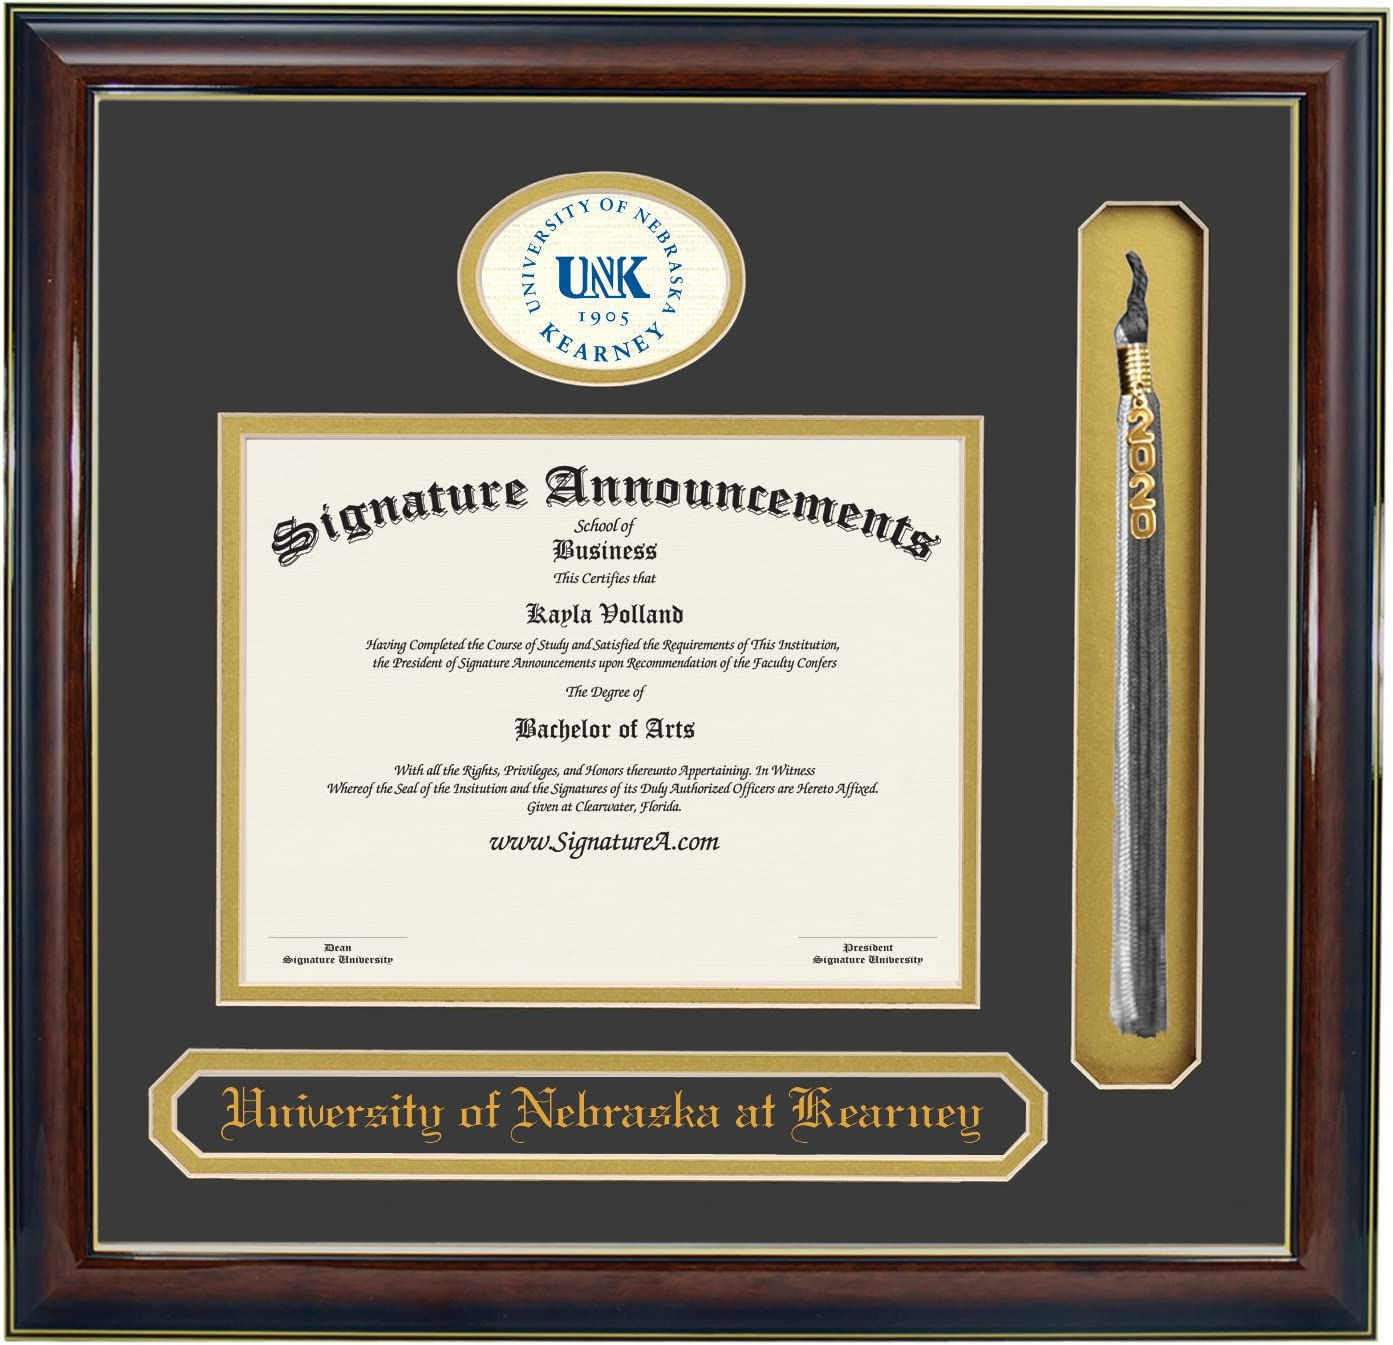 Signature Announcements Limited price sale University-of-Nebraska-at-Kearney Underg Superior